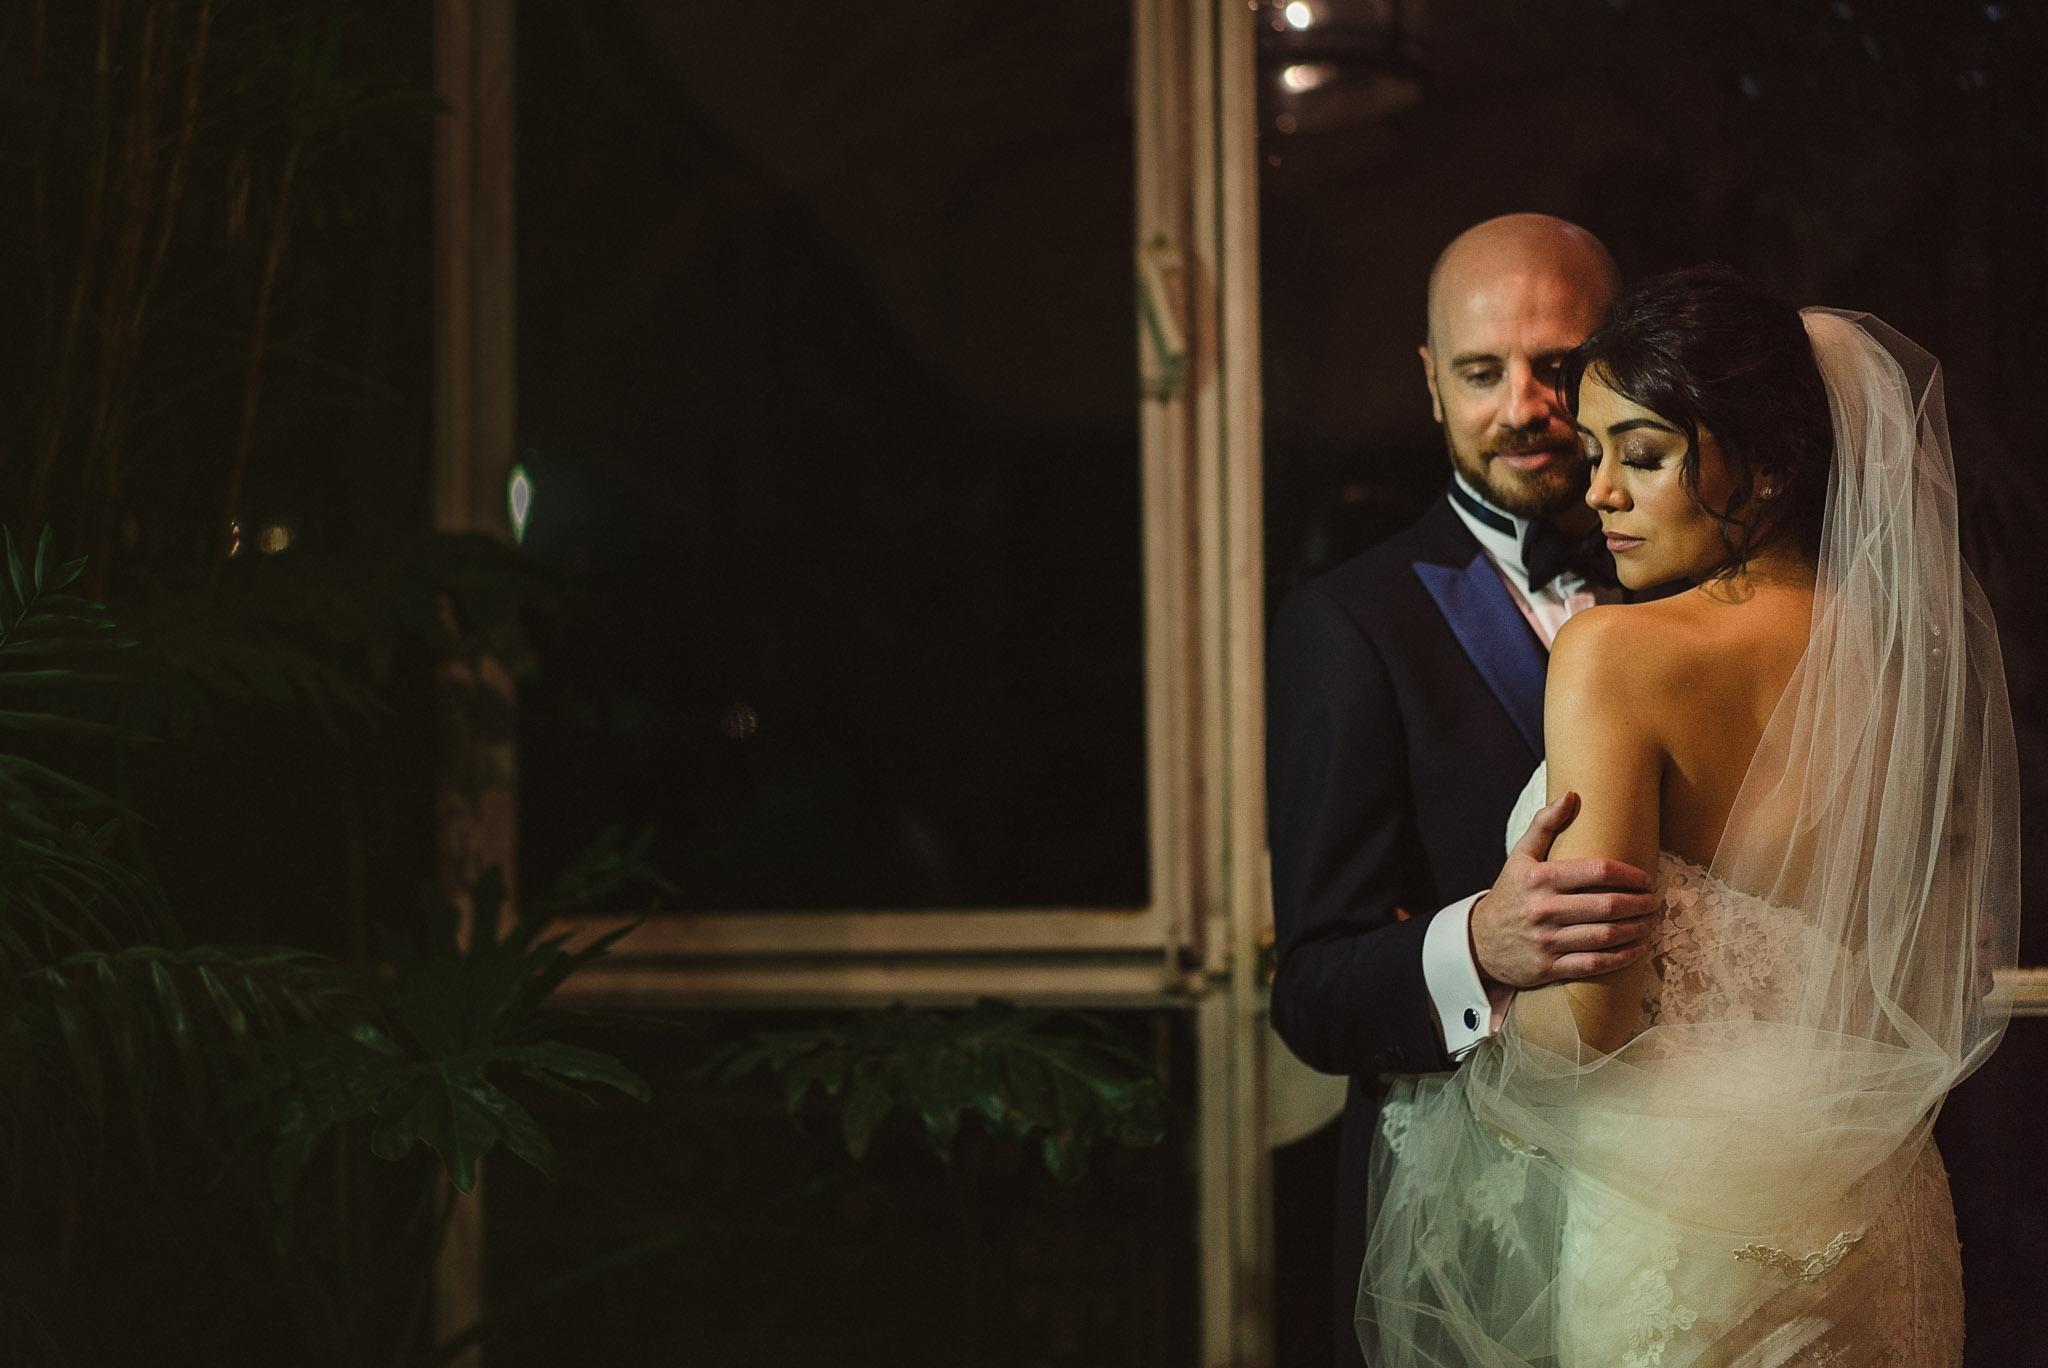 ©www.mauriziosolisbroca.com-20161001maurizio-solis-broca-mexico-canada-wedding-photographer20161001DSC08063-Edit.jpg